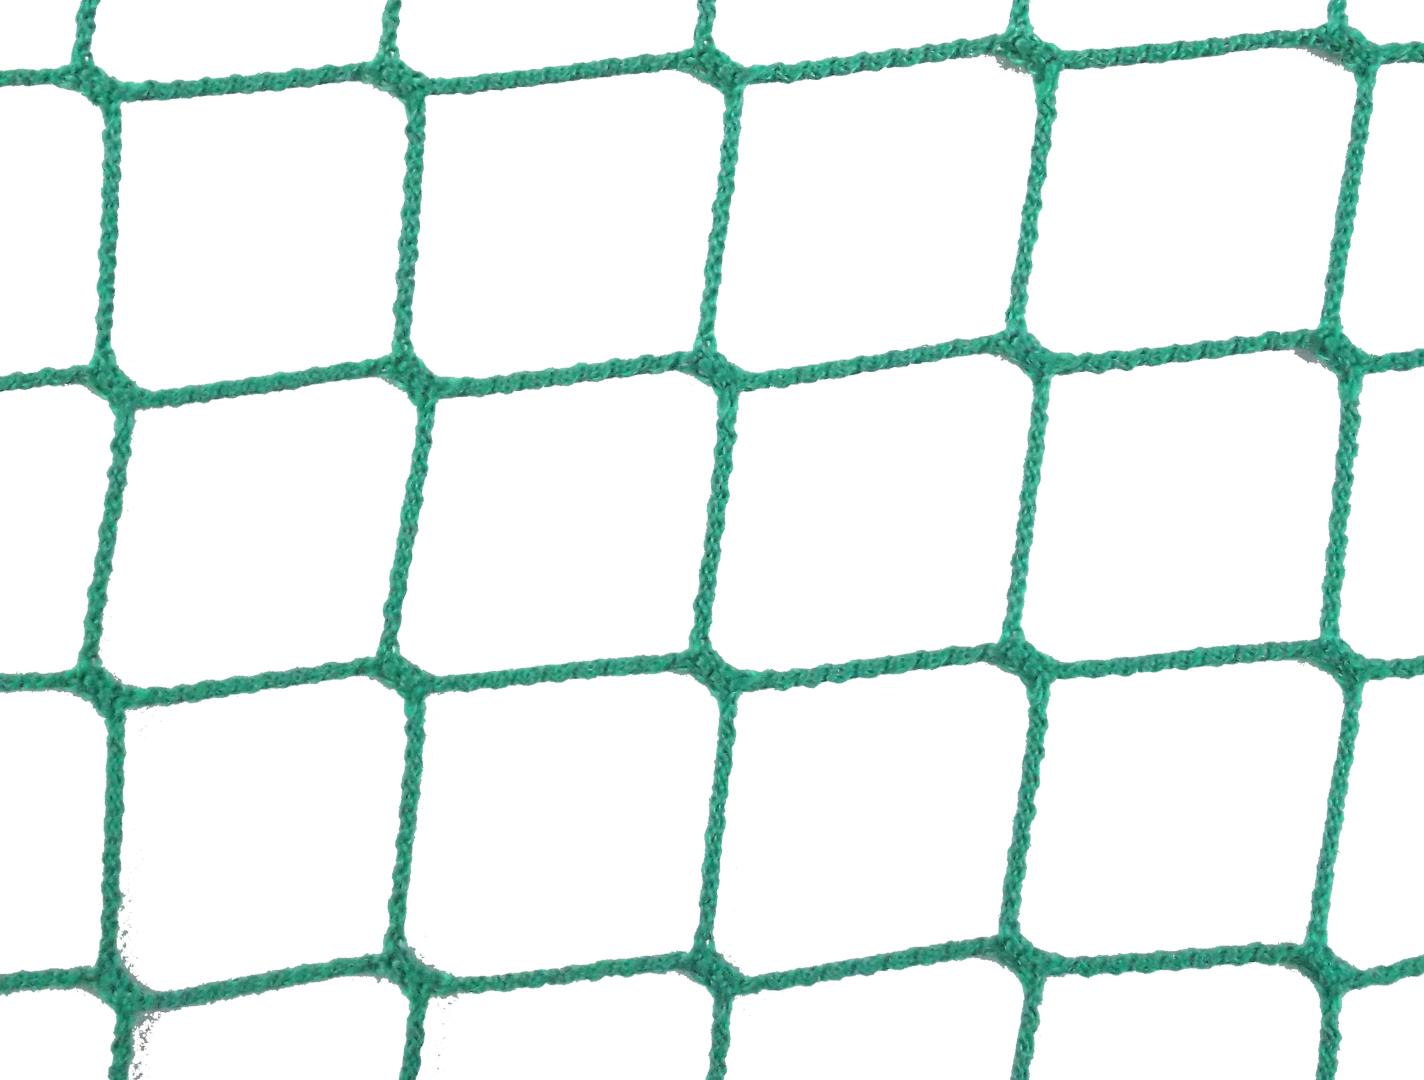 PP Knotless Net